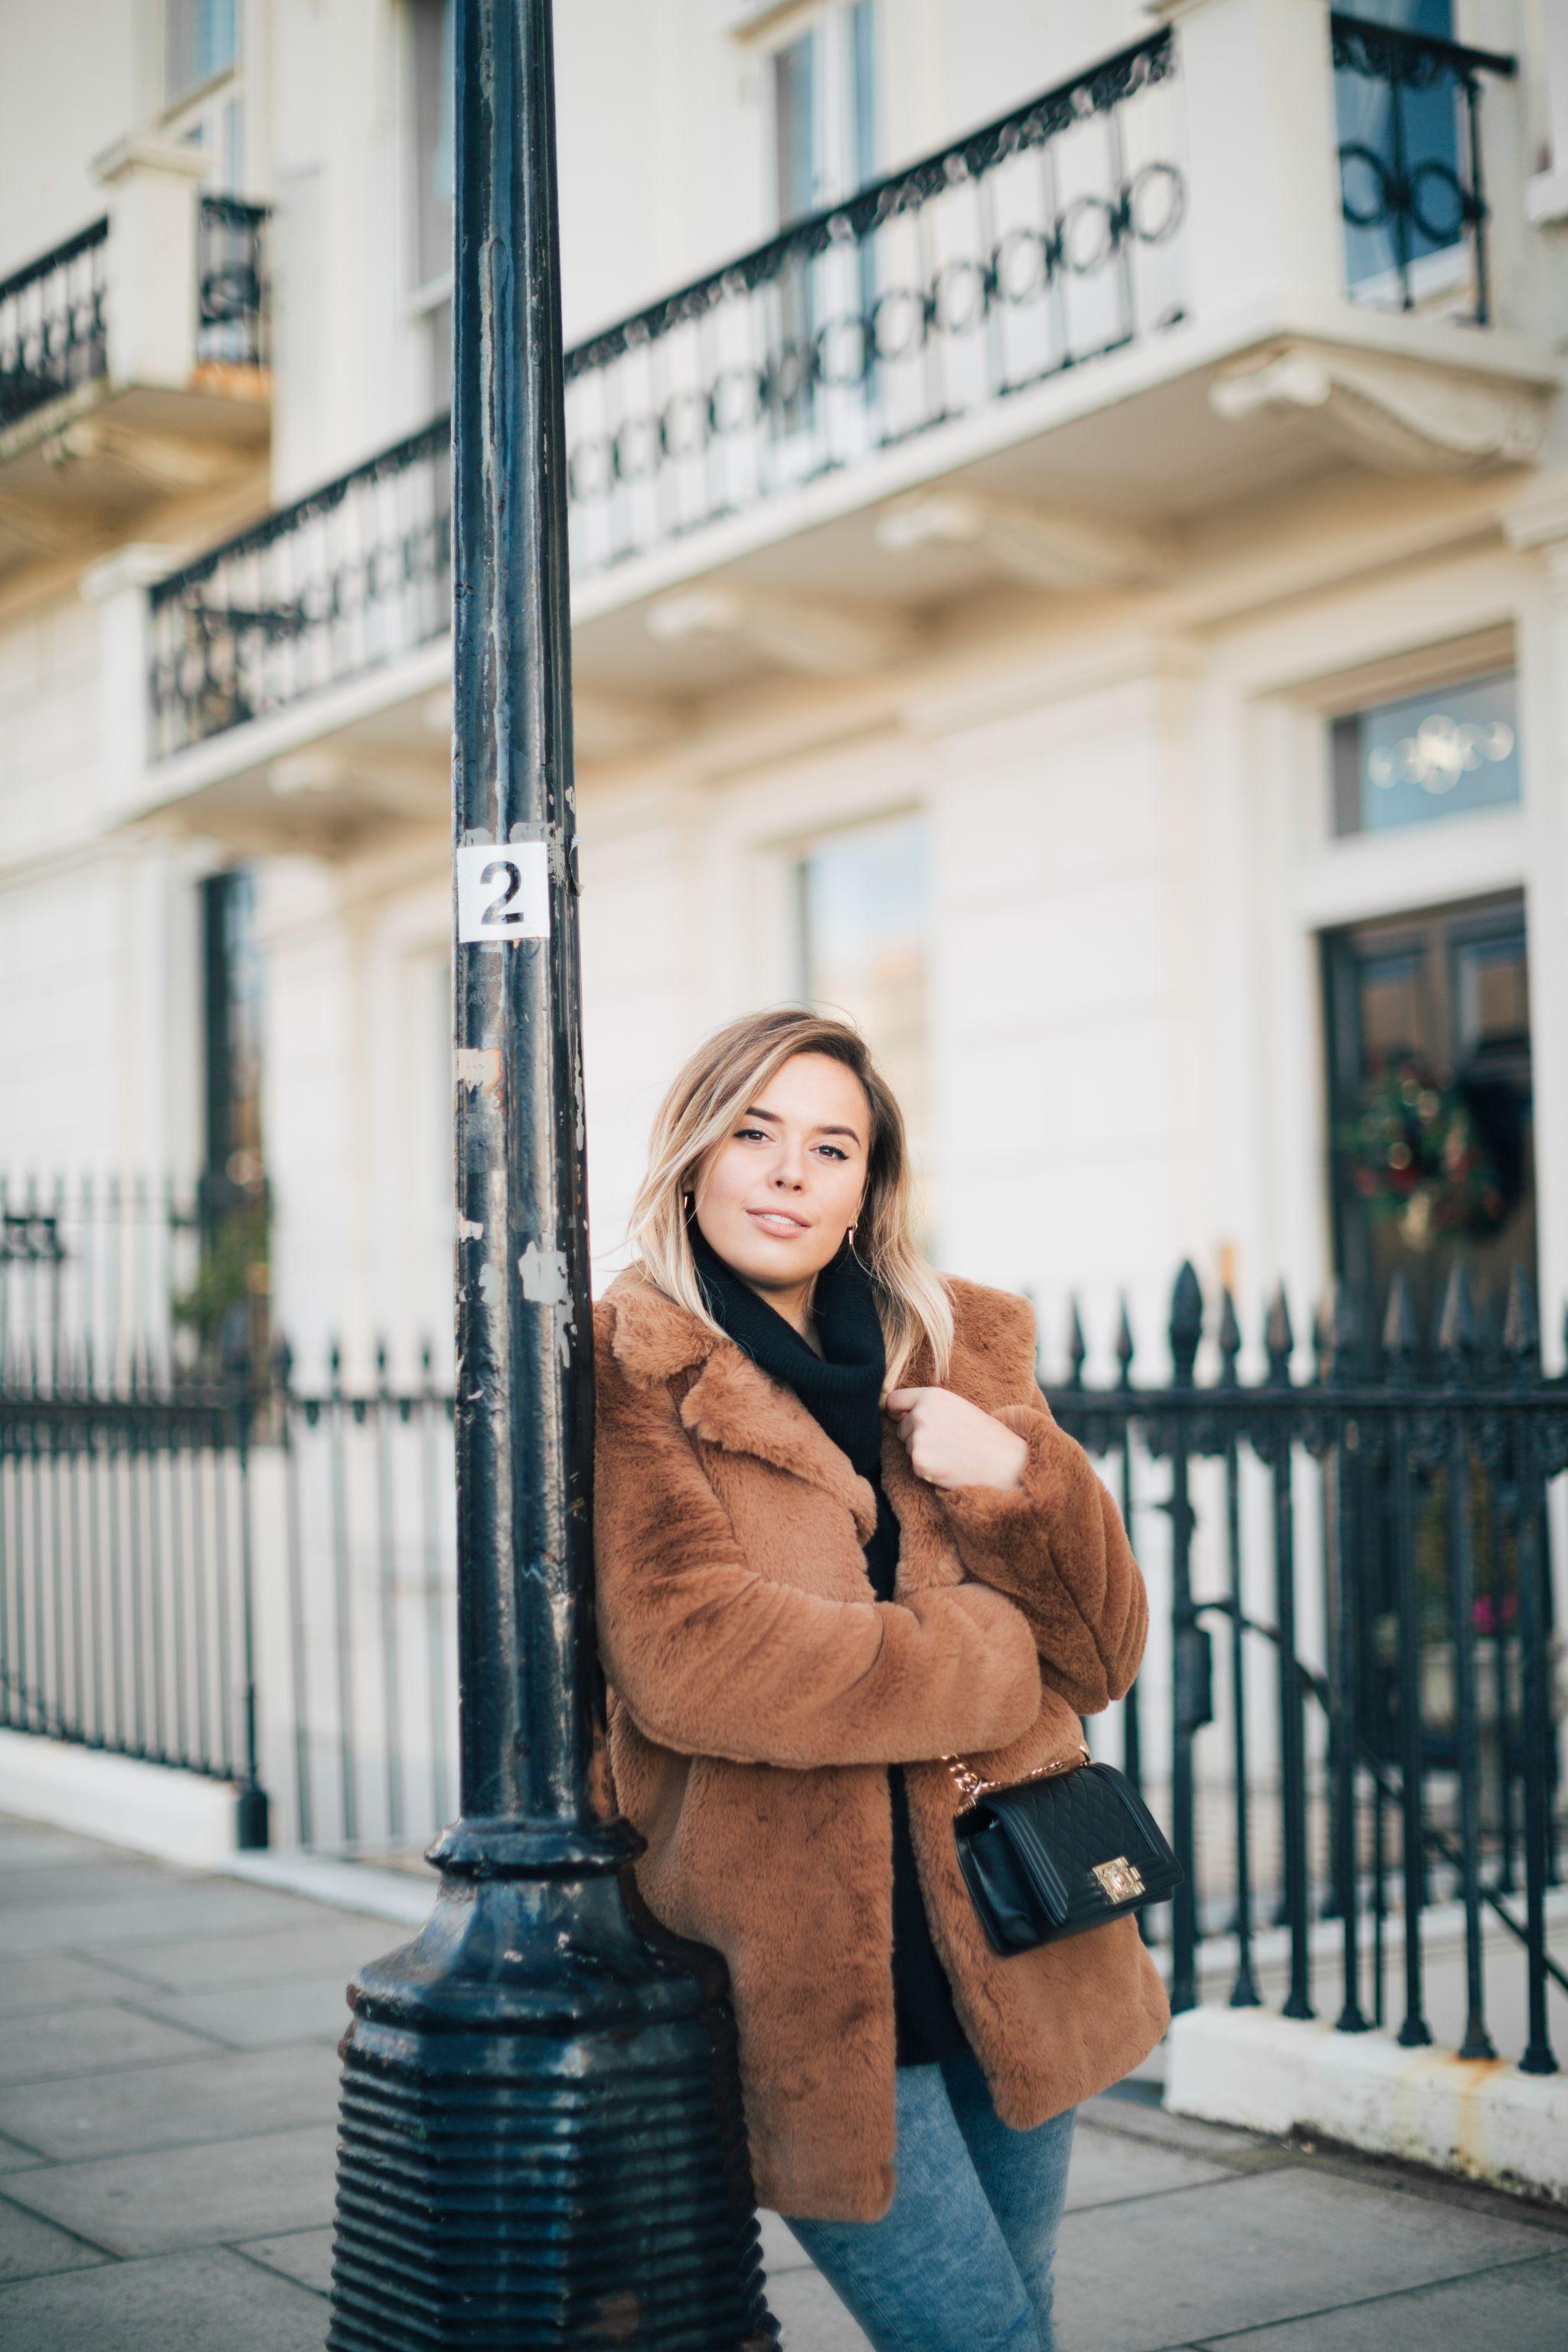 suzie-hello-october-teddy-coat-winter-outfit-chanel-bag-december-2017-9